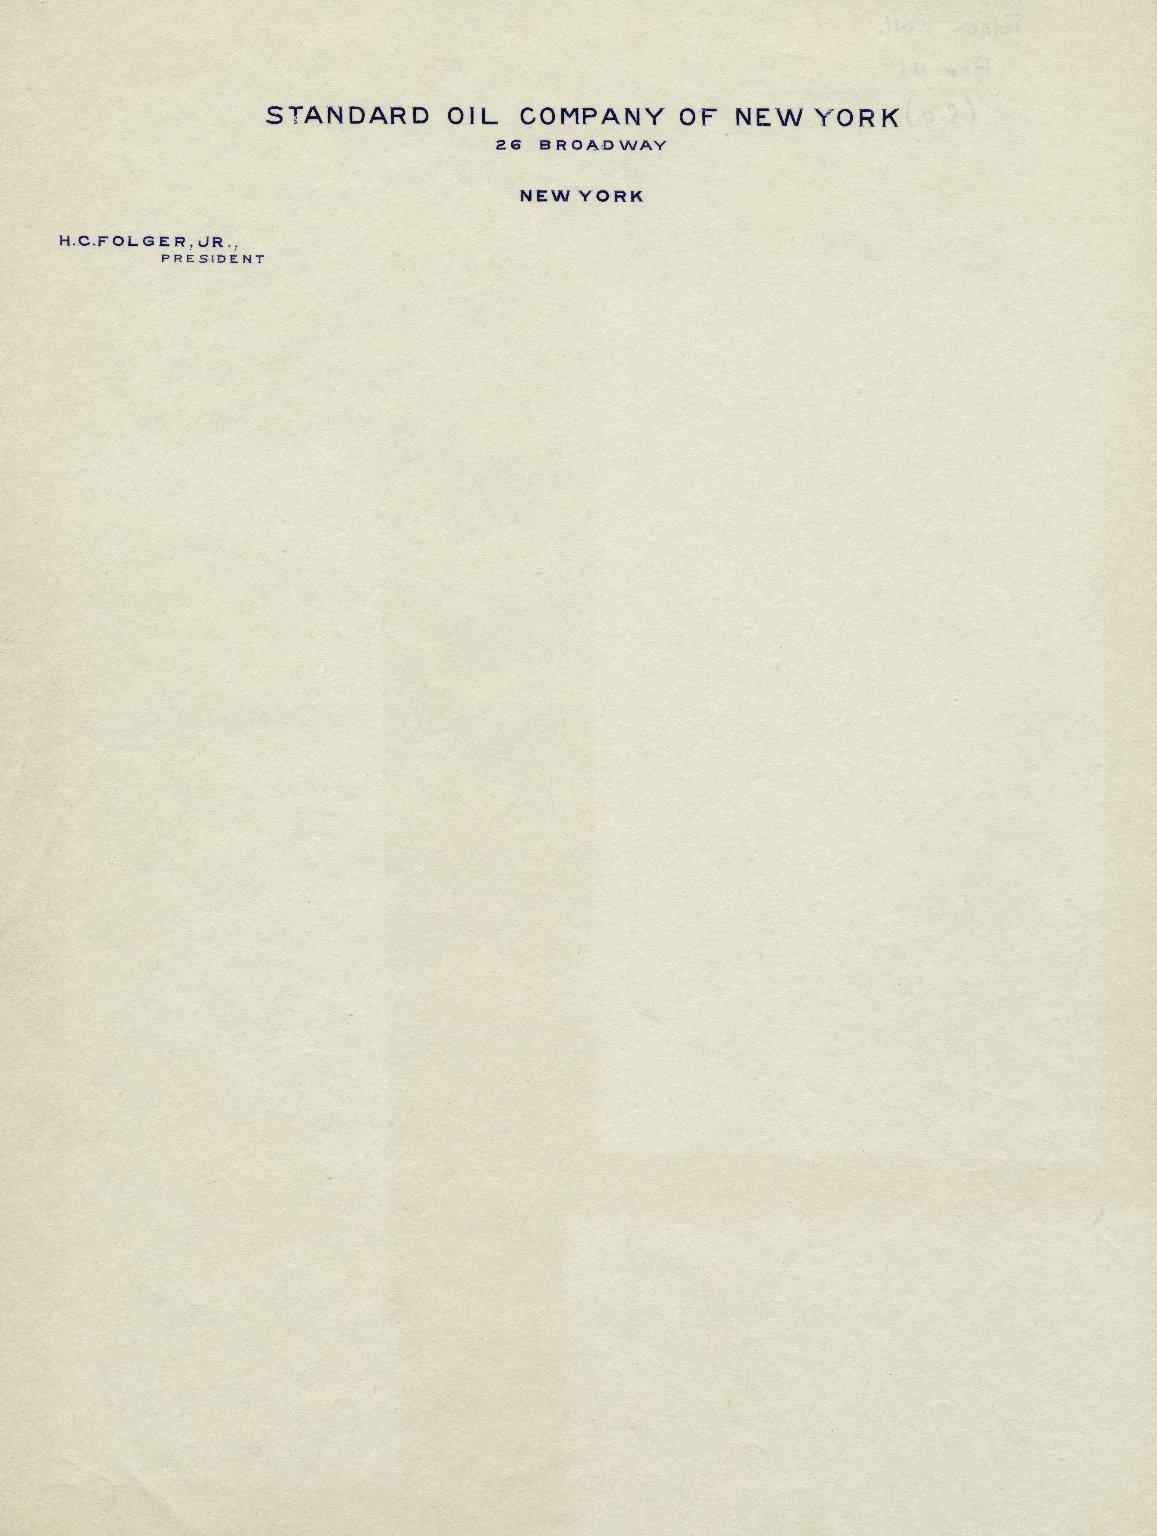 Standard Oil Company letterhead